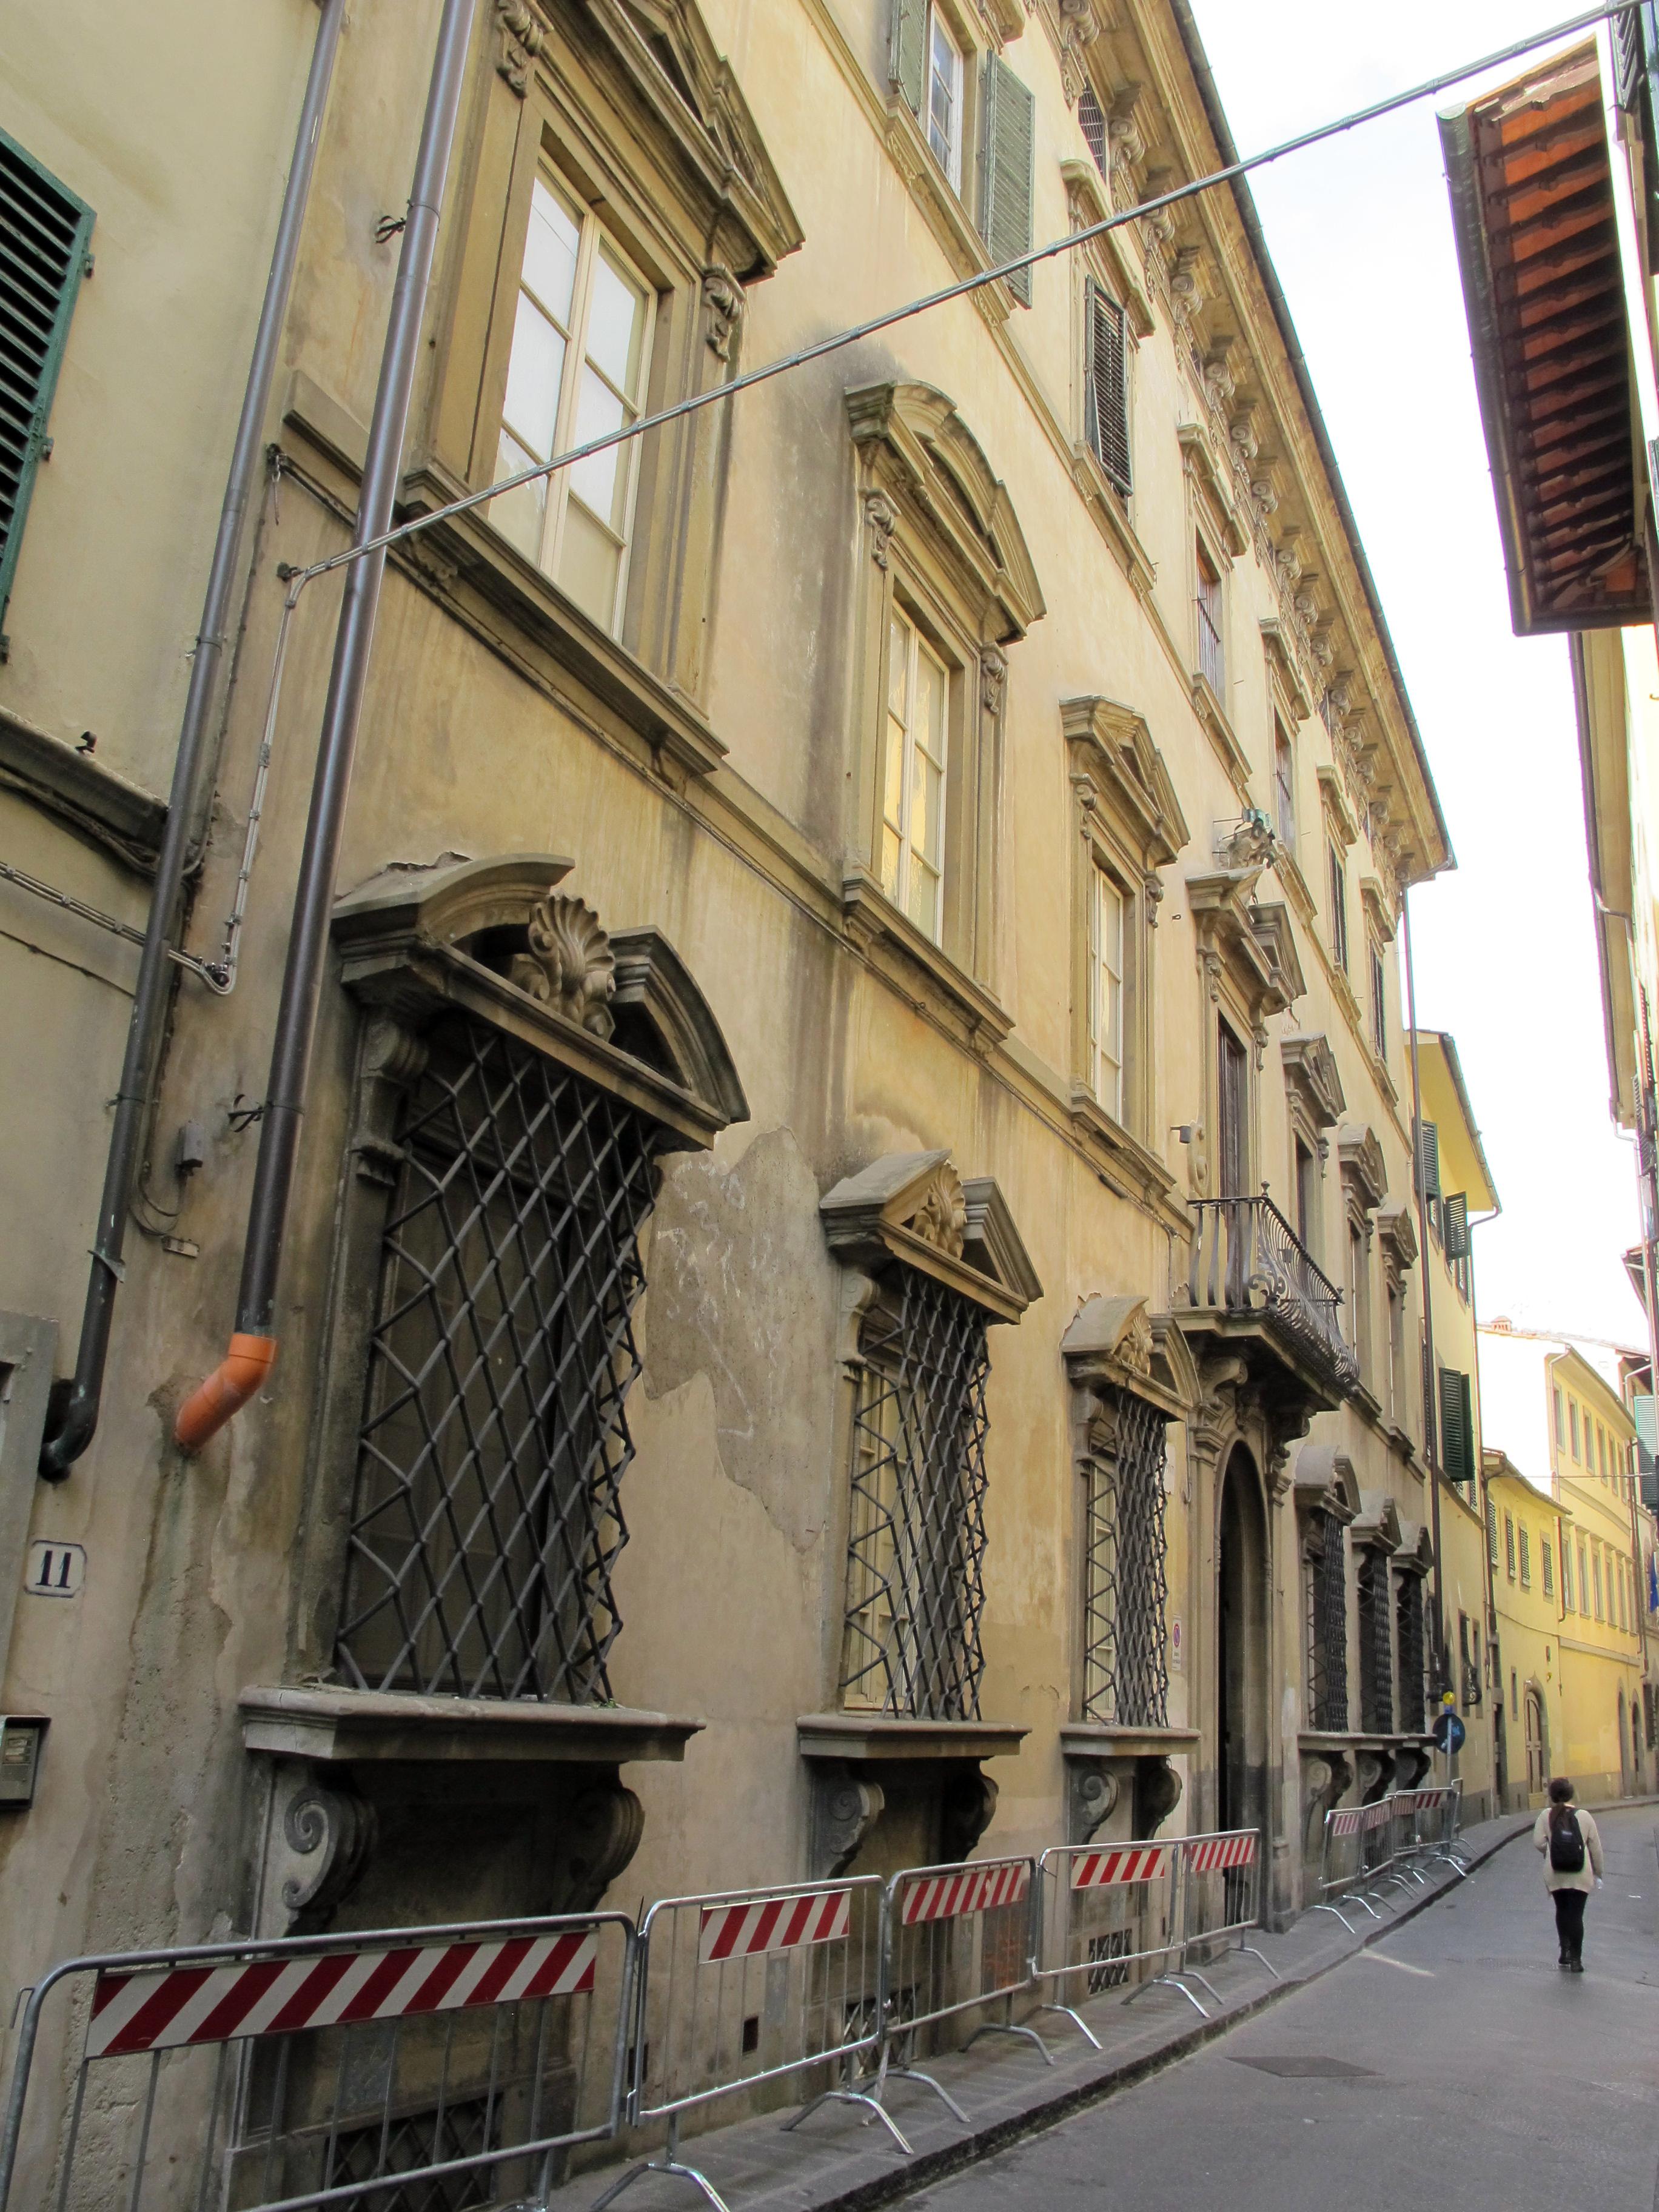 Borgo_pinti_13%2C_palazzo_roffia_01.JPG